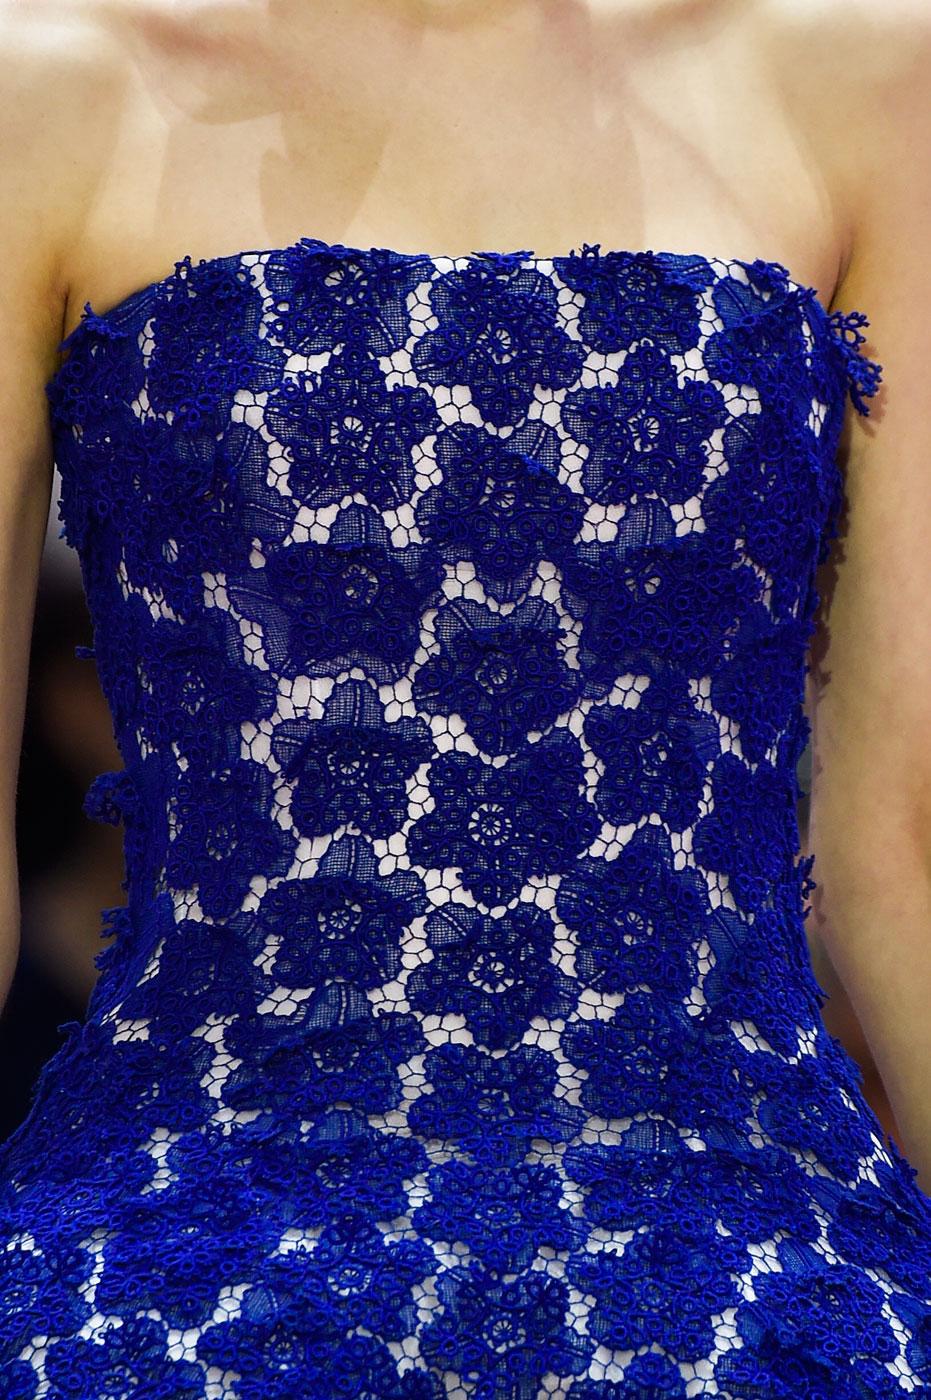 Christian-Dior-fashion-runway-show-close-ups-haute-couture-paris-spring-summer-2015-the-impression-101